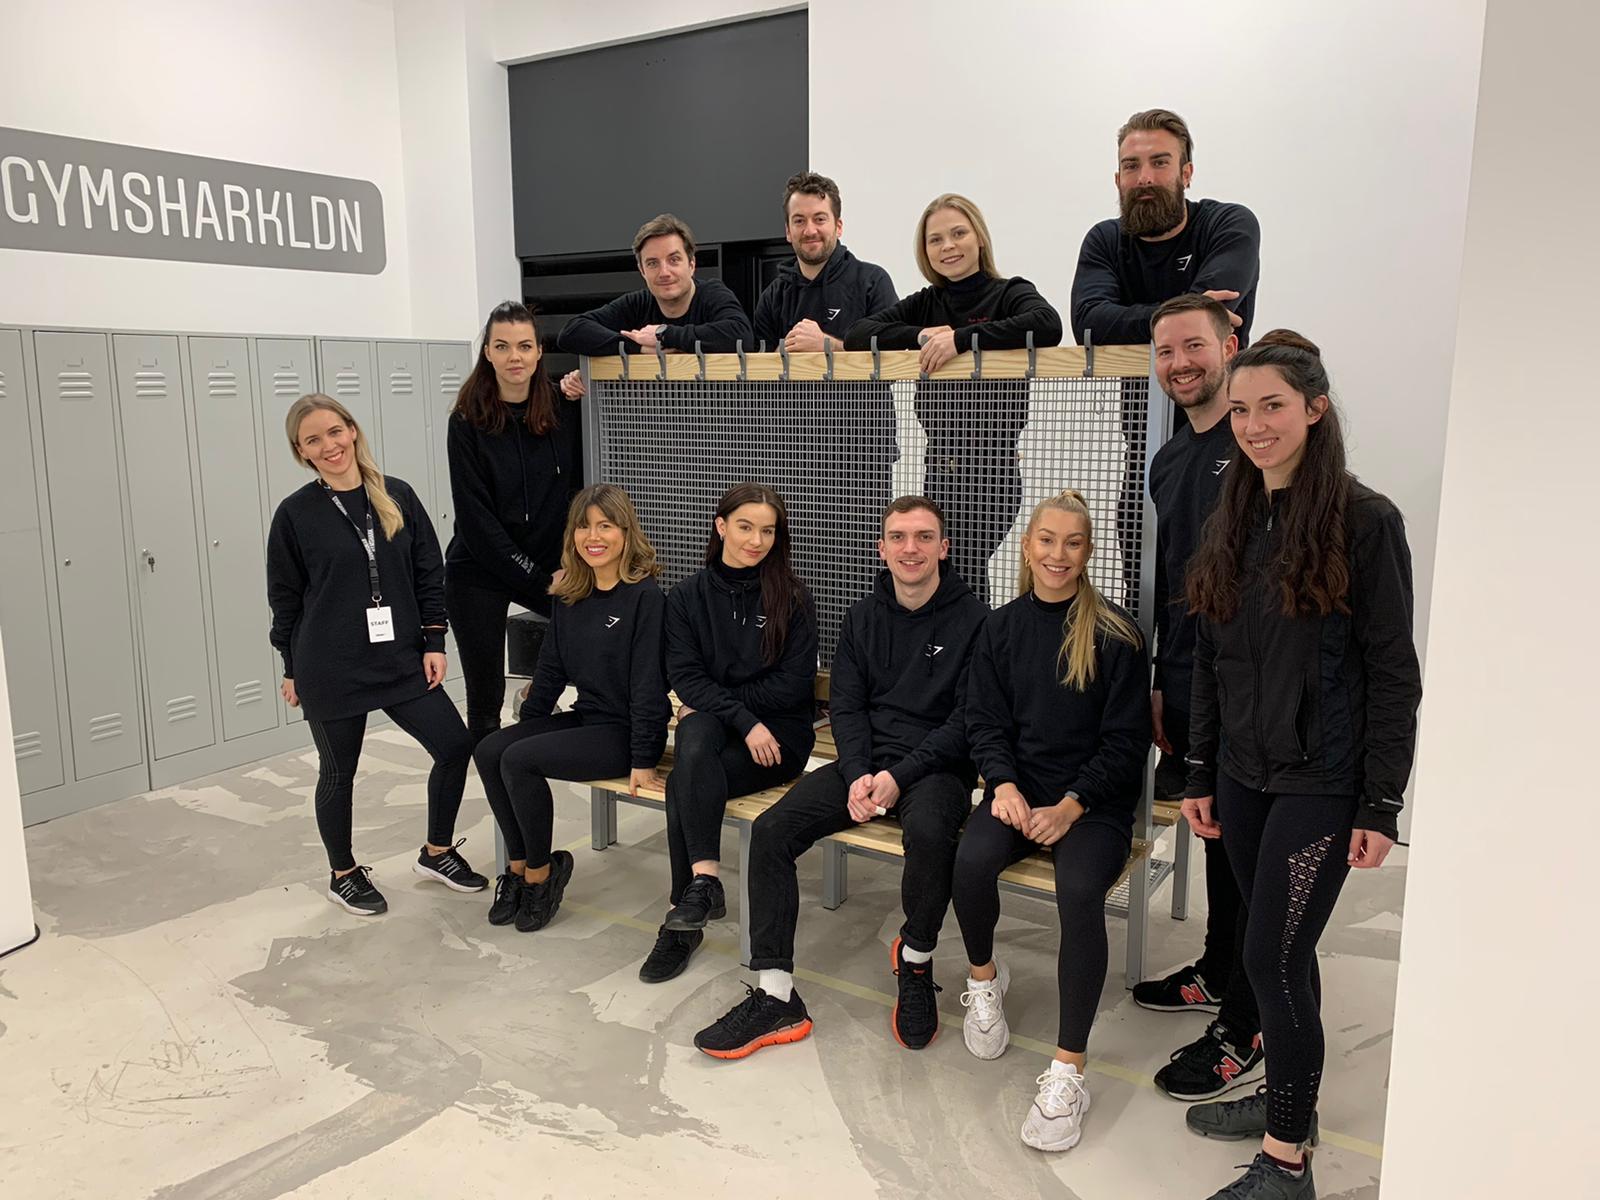 London Retail Staff